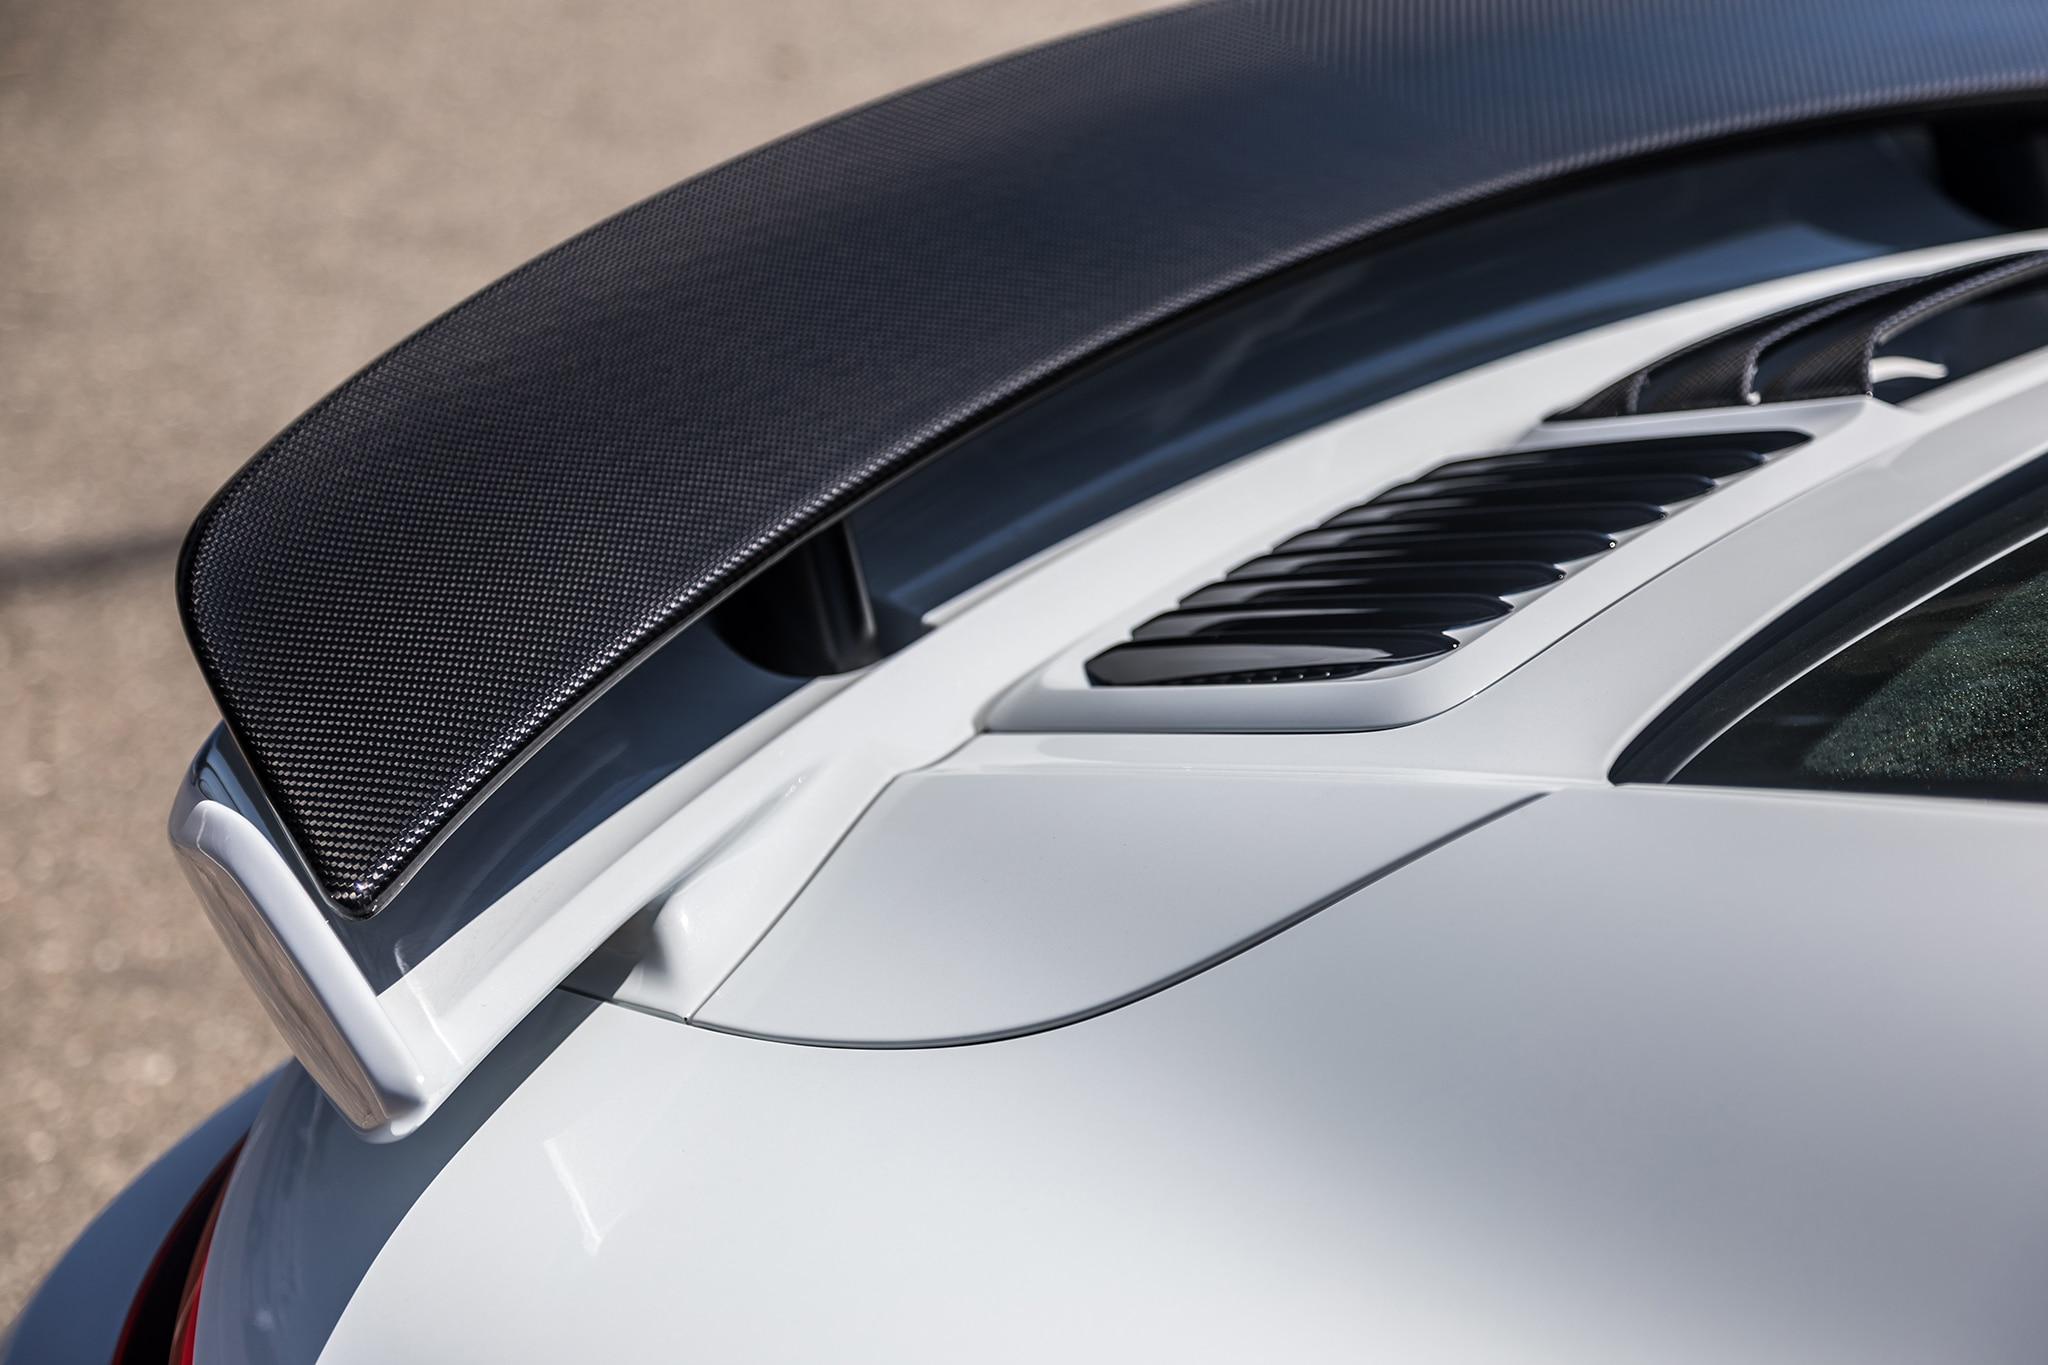 2018 Porsche 911 Turbo S Exclusive Rear Spoiler 02